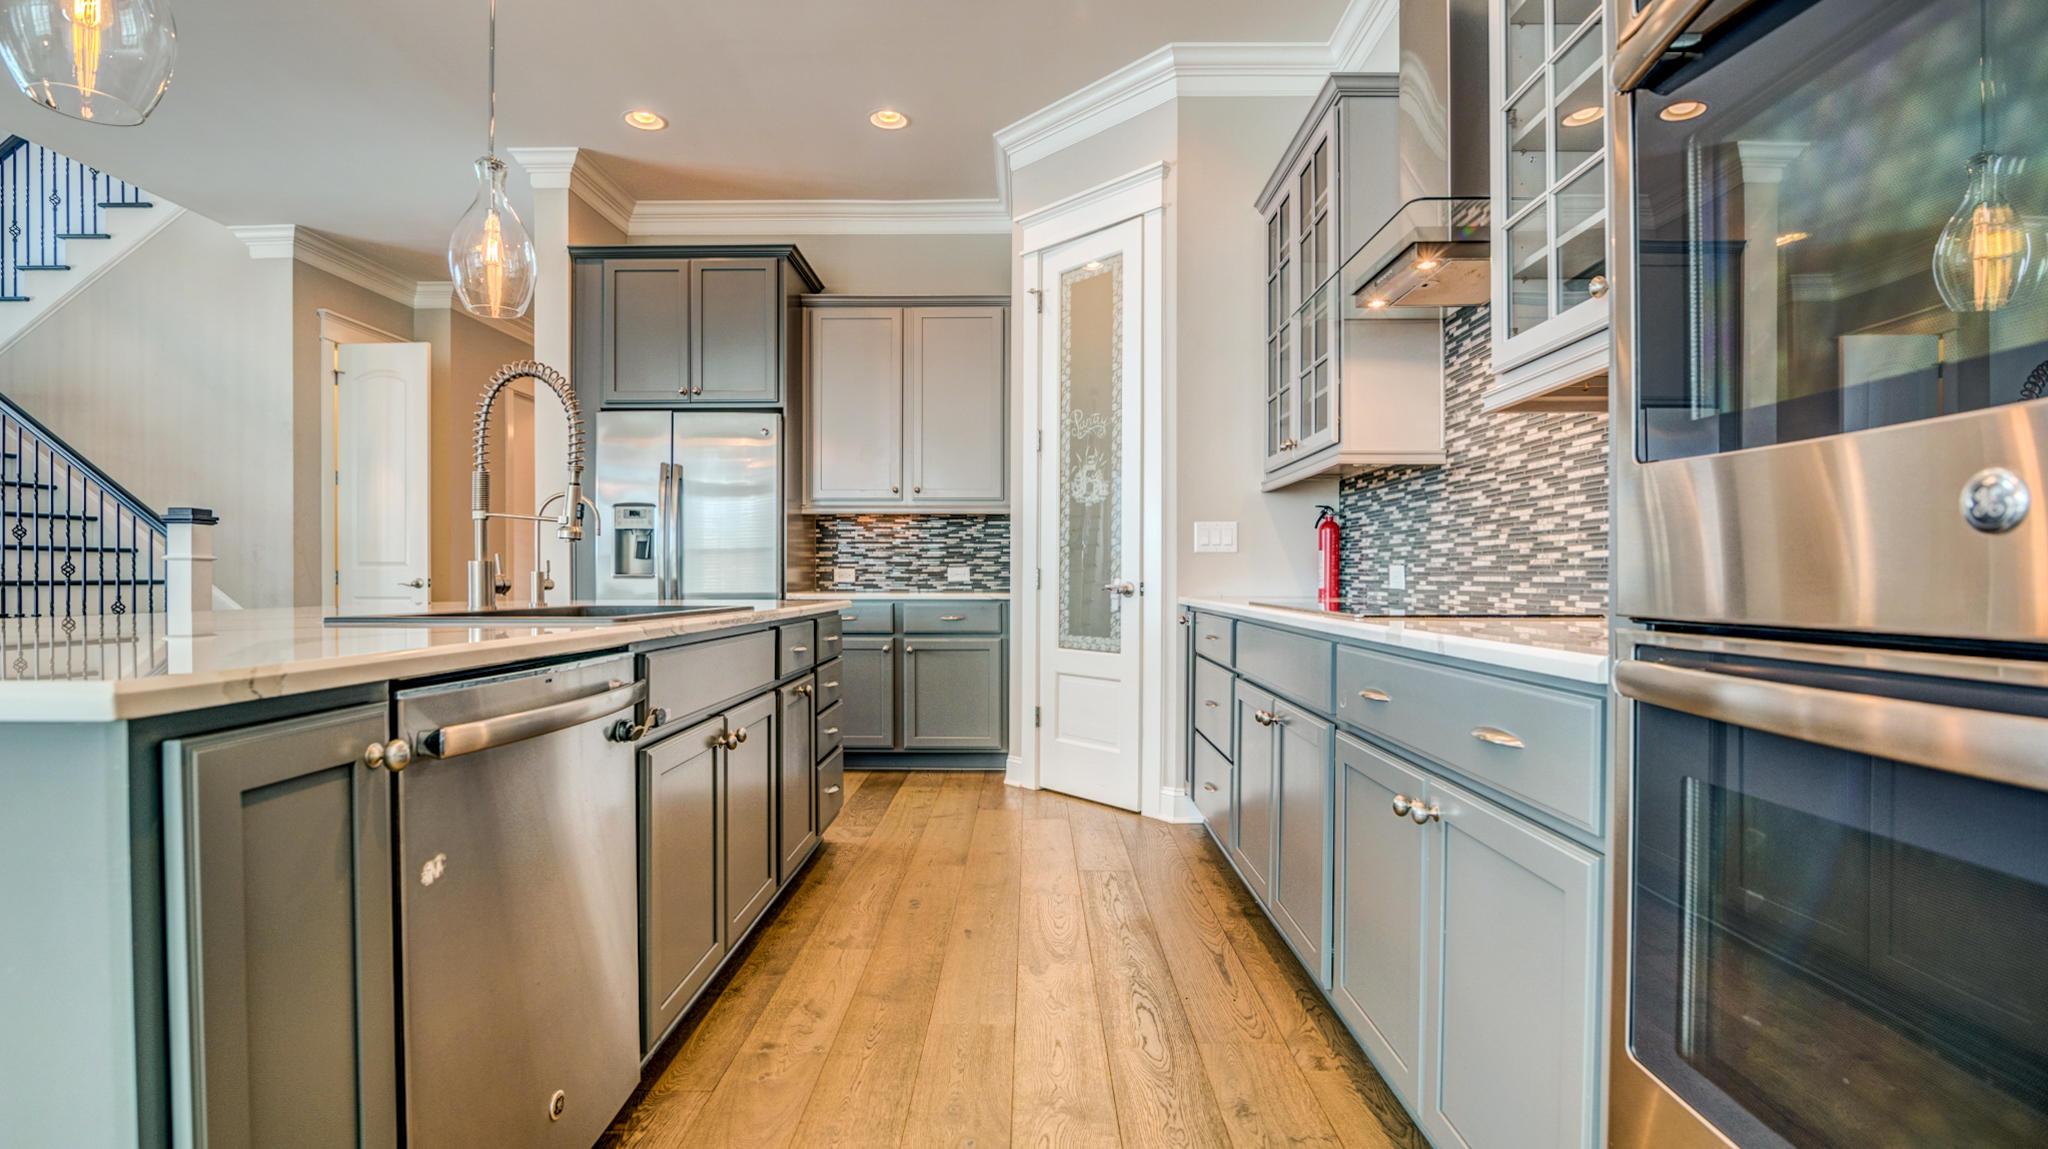 Carolina Park Homes For Sale - 3687 Spindrift, Mount Pleasant, SC - 11